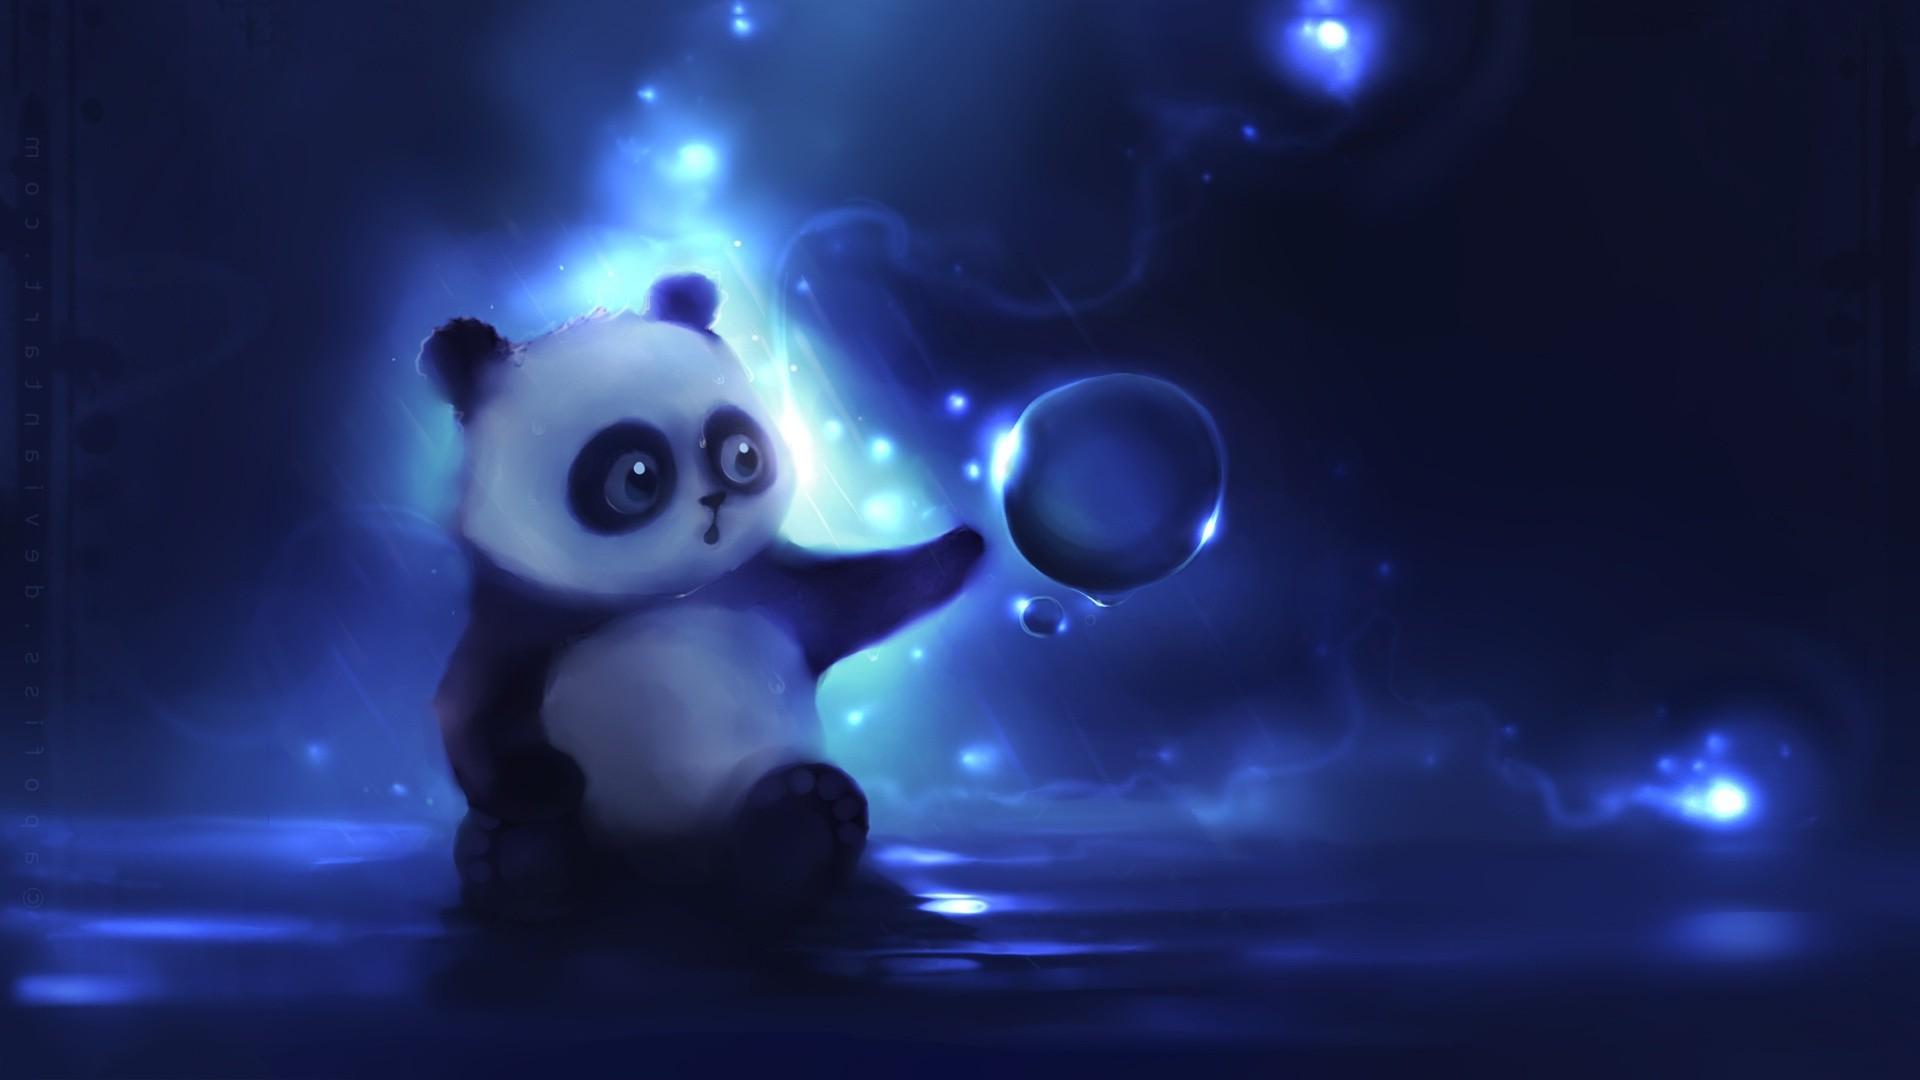 Res: 1920x1080, panda wallpaper hd HD wallpapermonkey Panda Wallpapers Pack V Cute Baby Panda  Wallpaper For iPhone HD Animal Wallpaper for